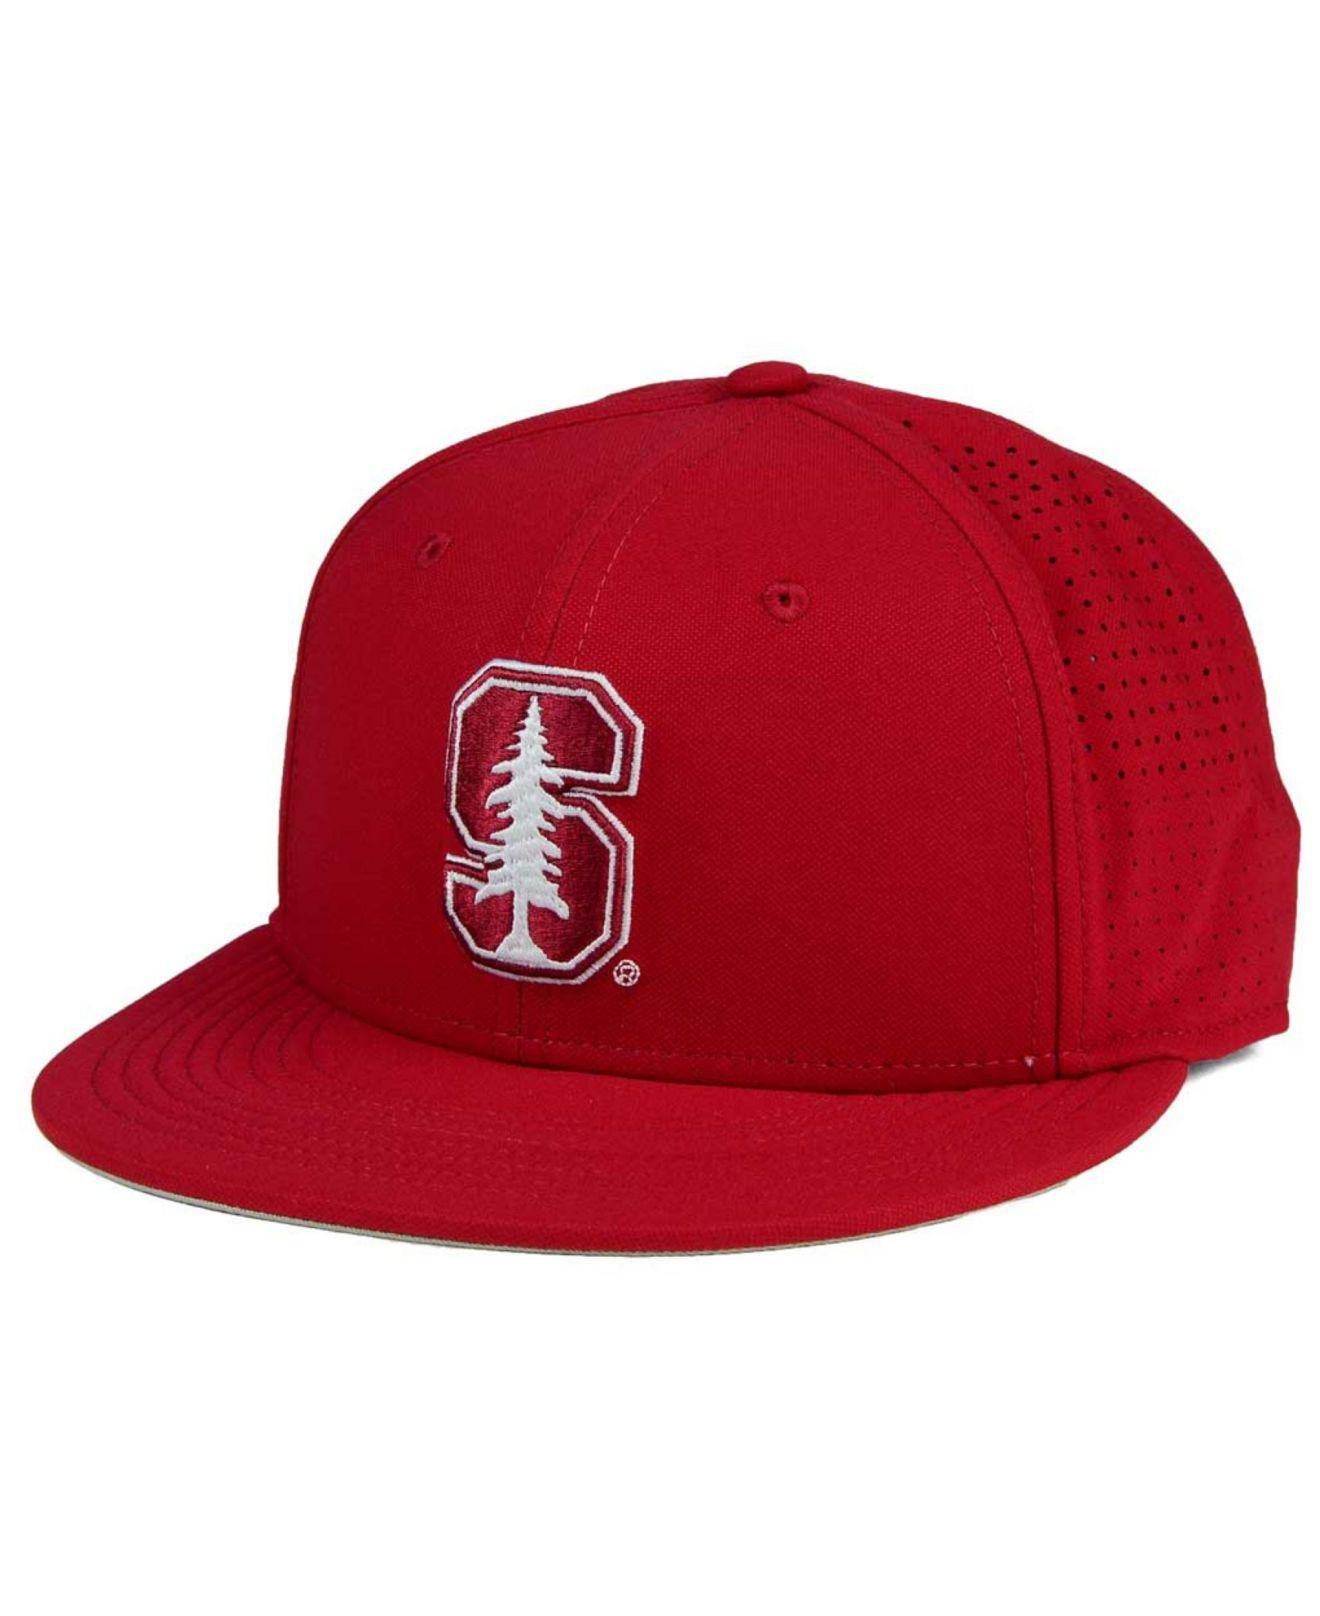 meet f4526 b53b4 Nike. Men s Red Stanford Cardinal True Vapor Fitted Cap